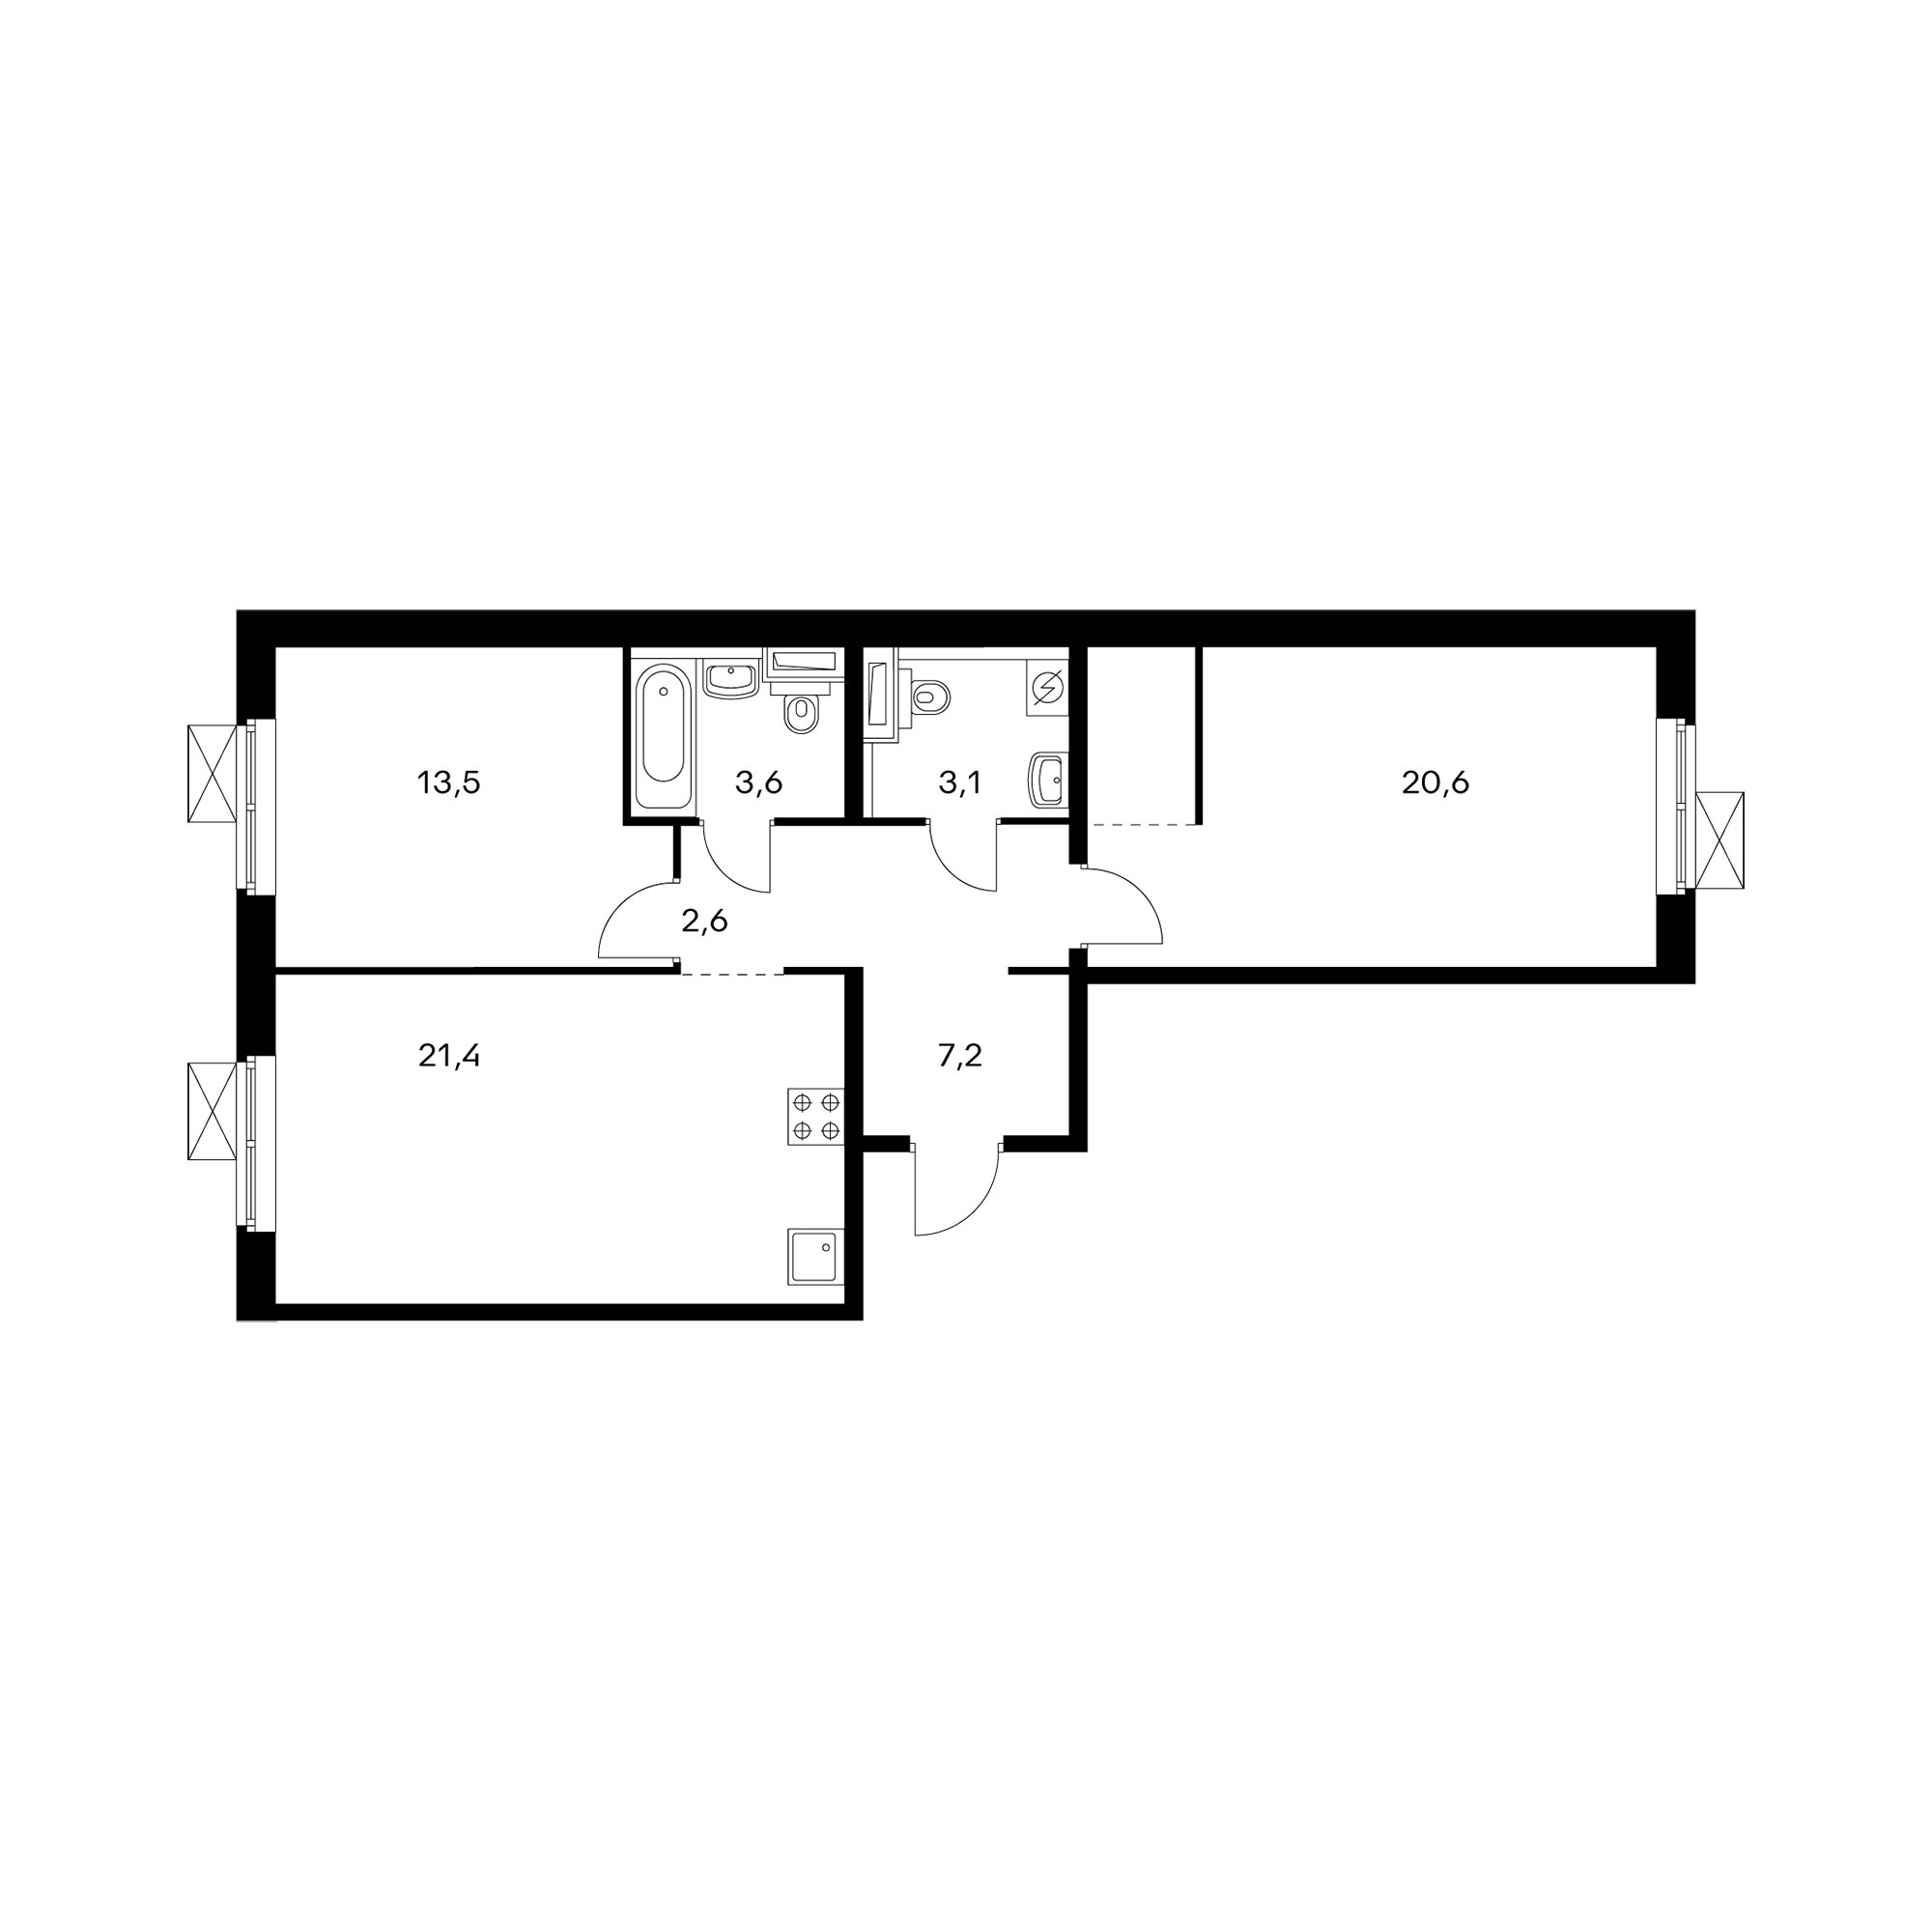 2EL3_7.2-1